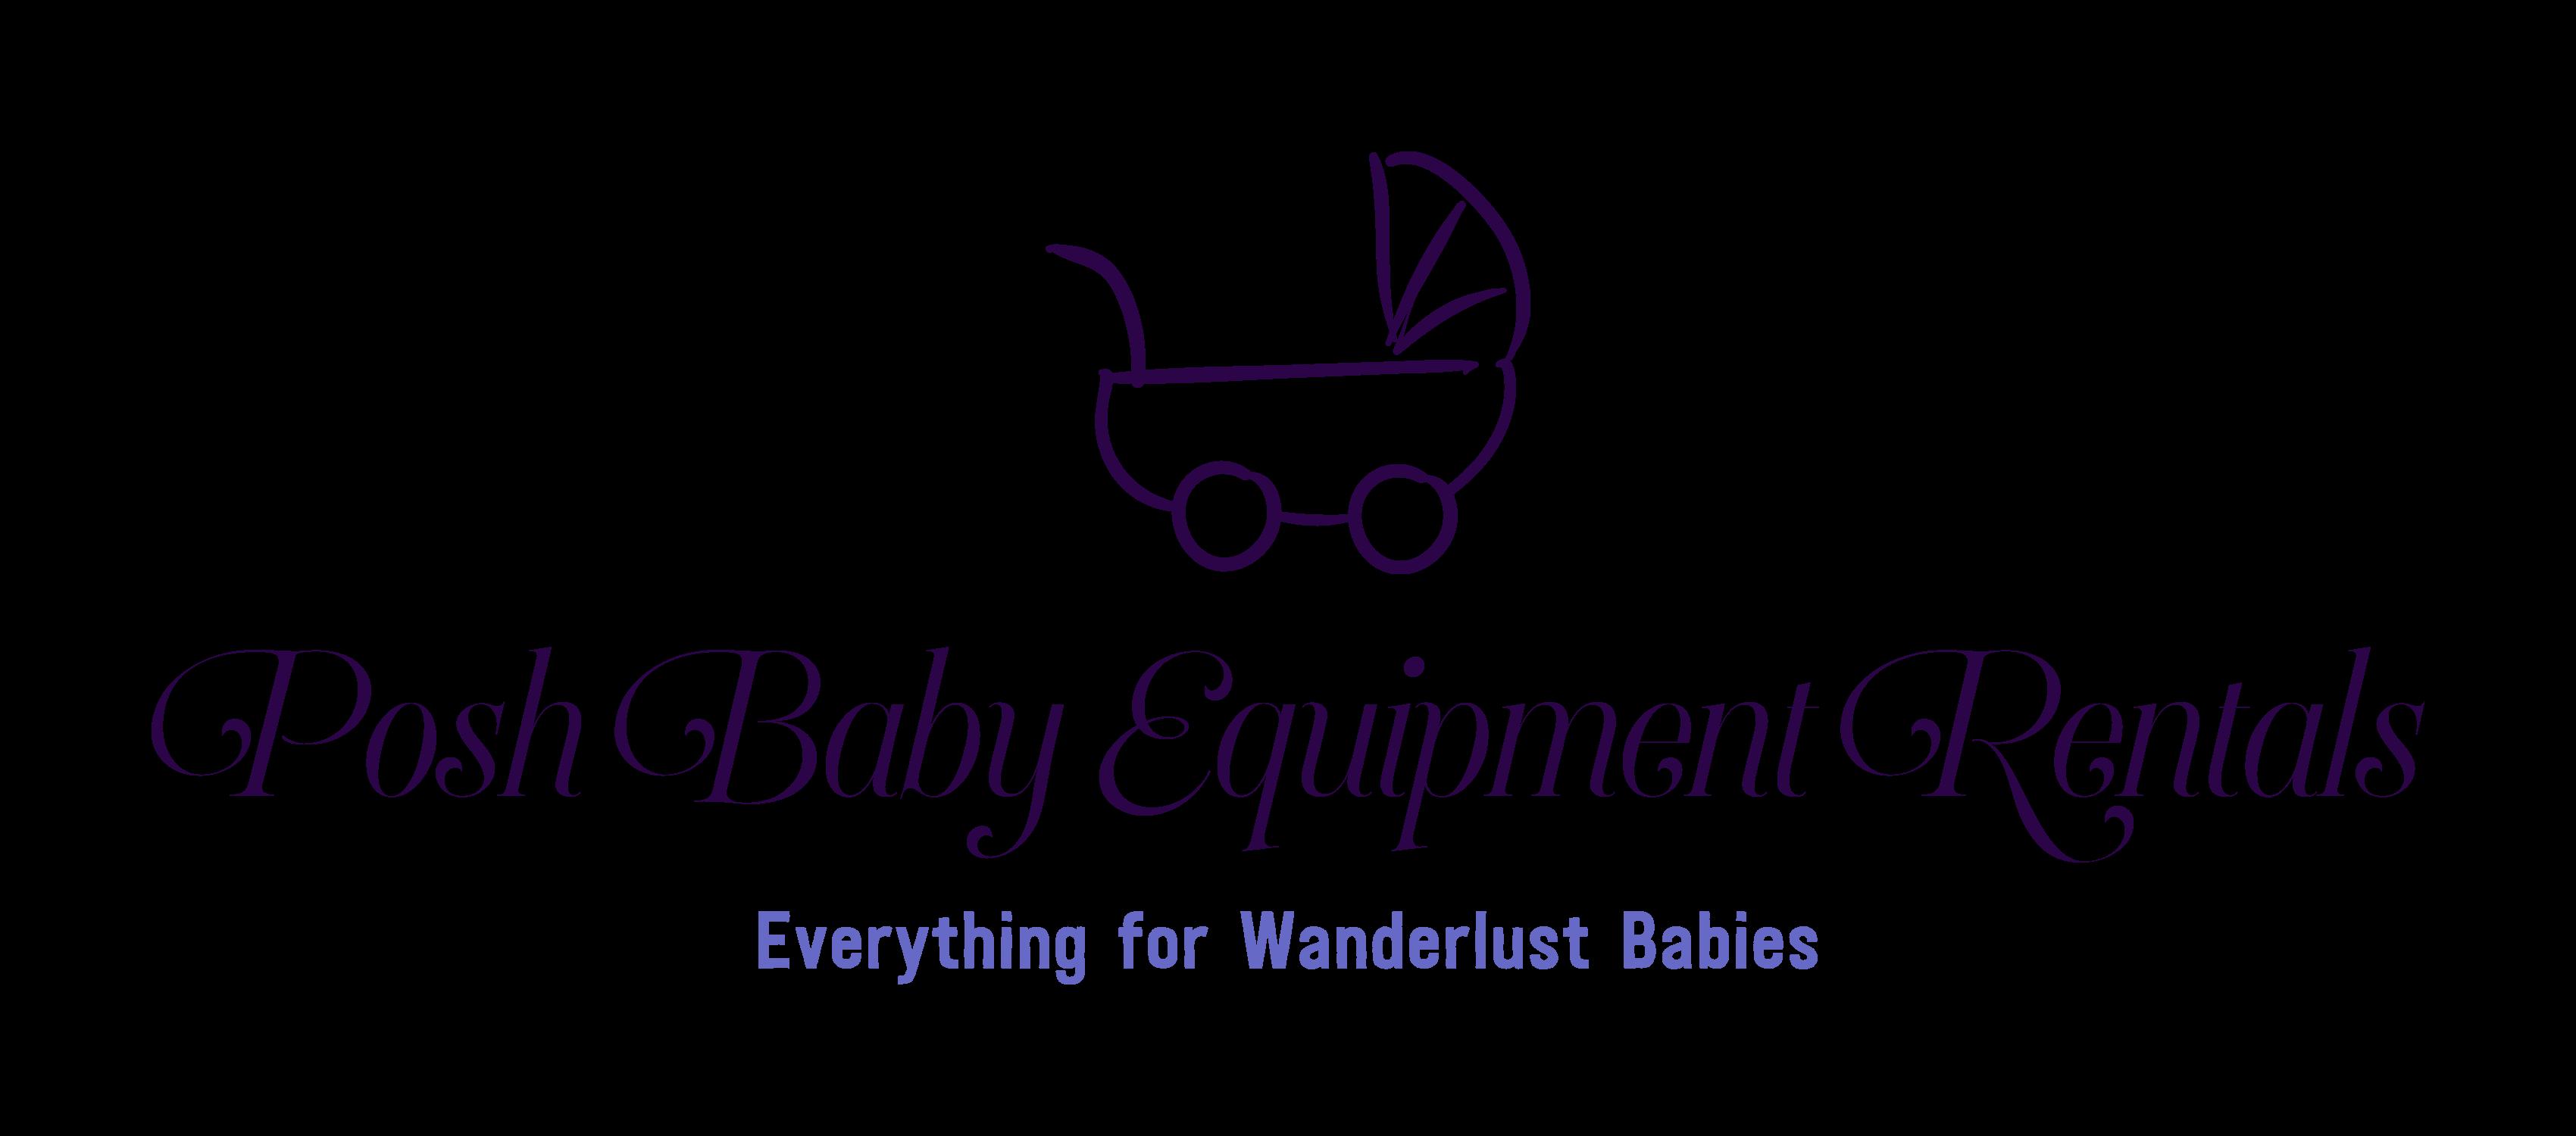 Posh Baby Equipment Rentals